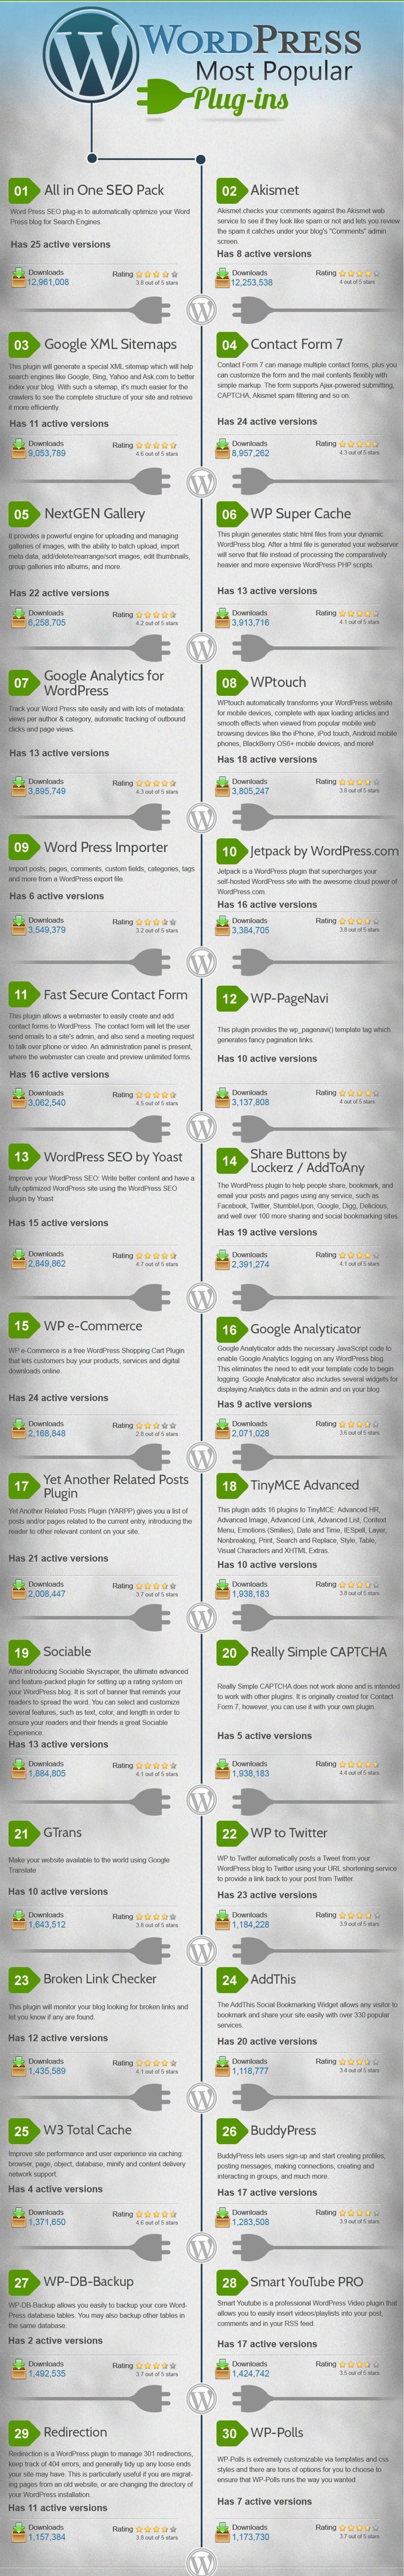 Checkout WordPress most popular plugins infographic